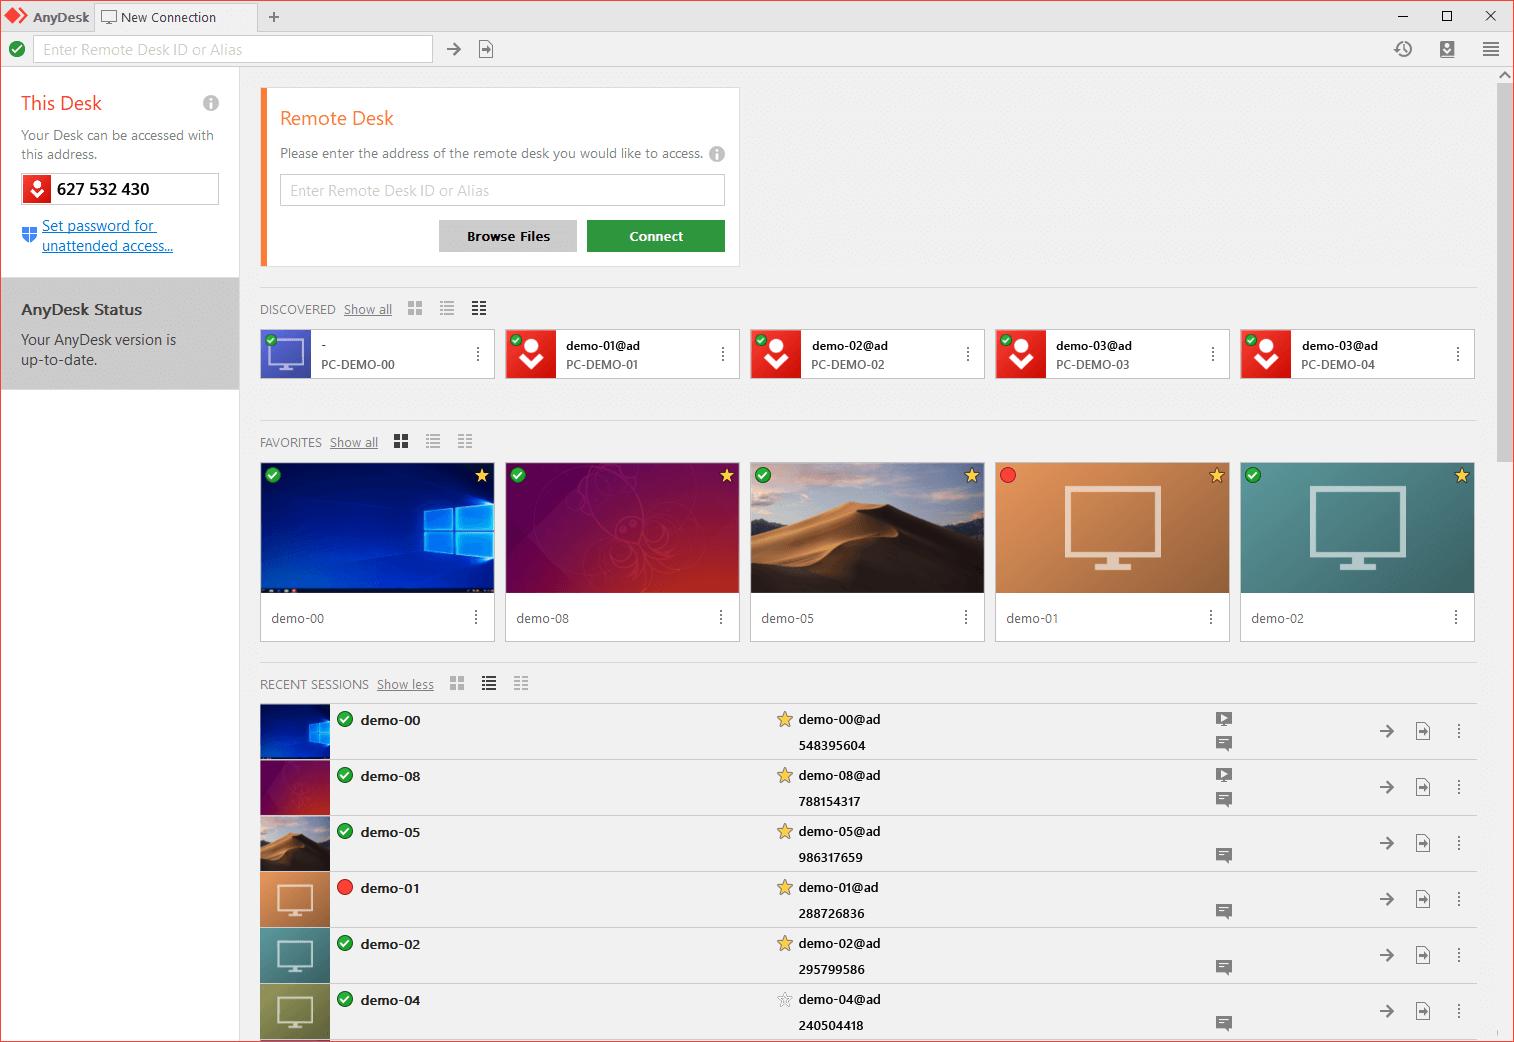 AnyDesk 6.2.3